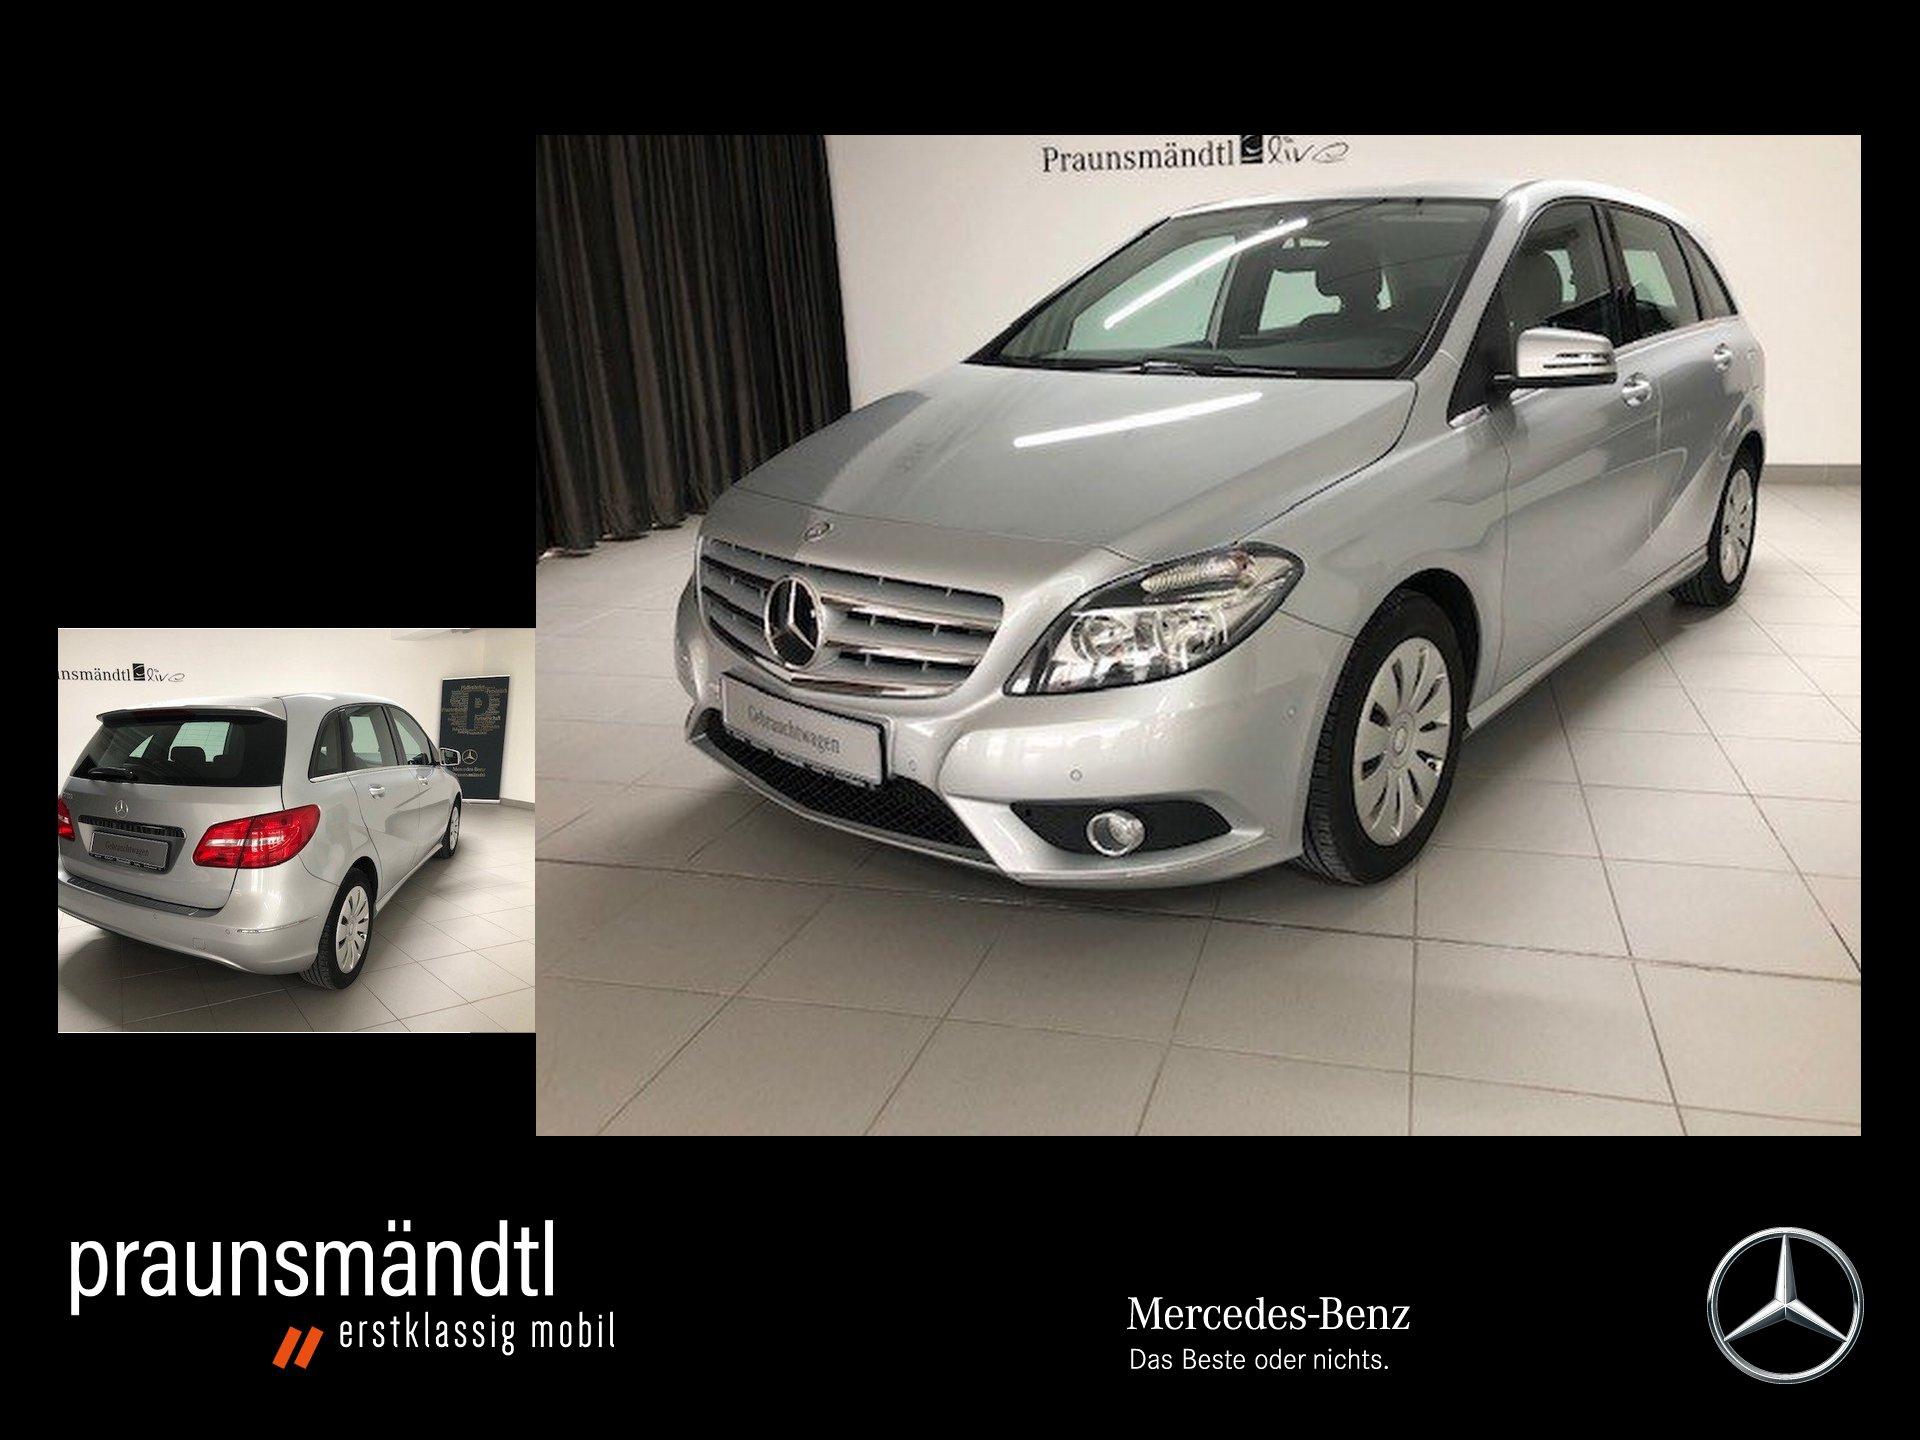 Mercedes-Benz B 200 Chrom 7ATG/AHK/PTS/SHZ/Tempomat, Jahr 2014, Benzin